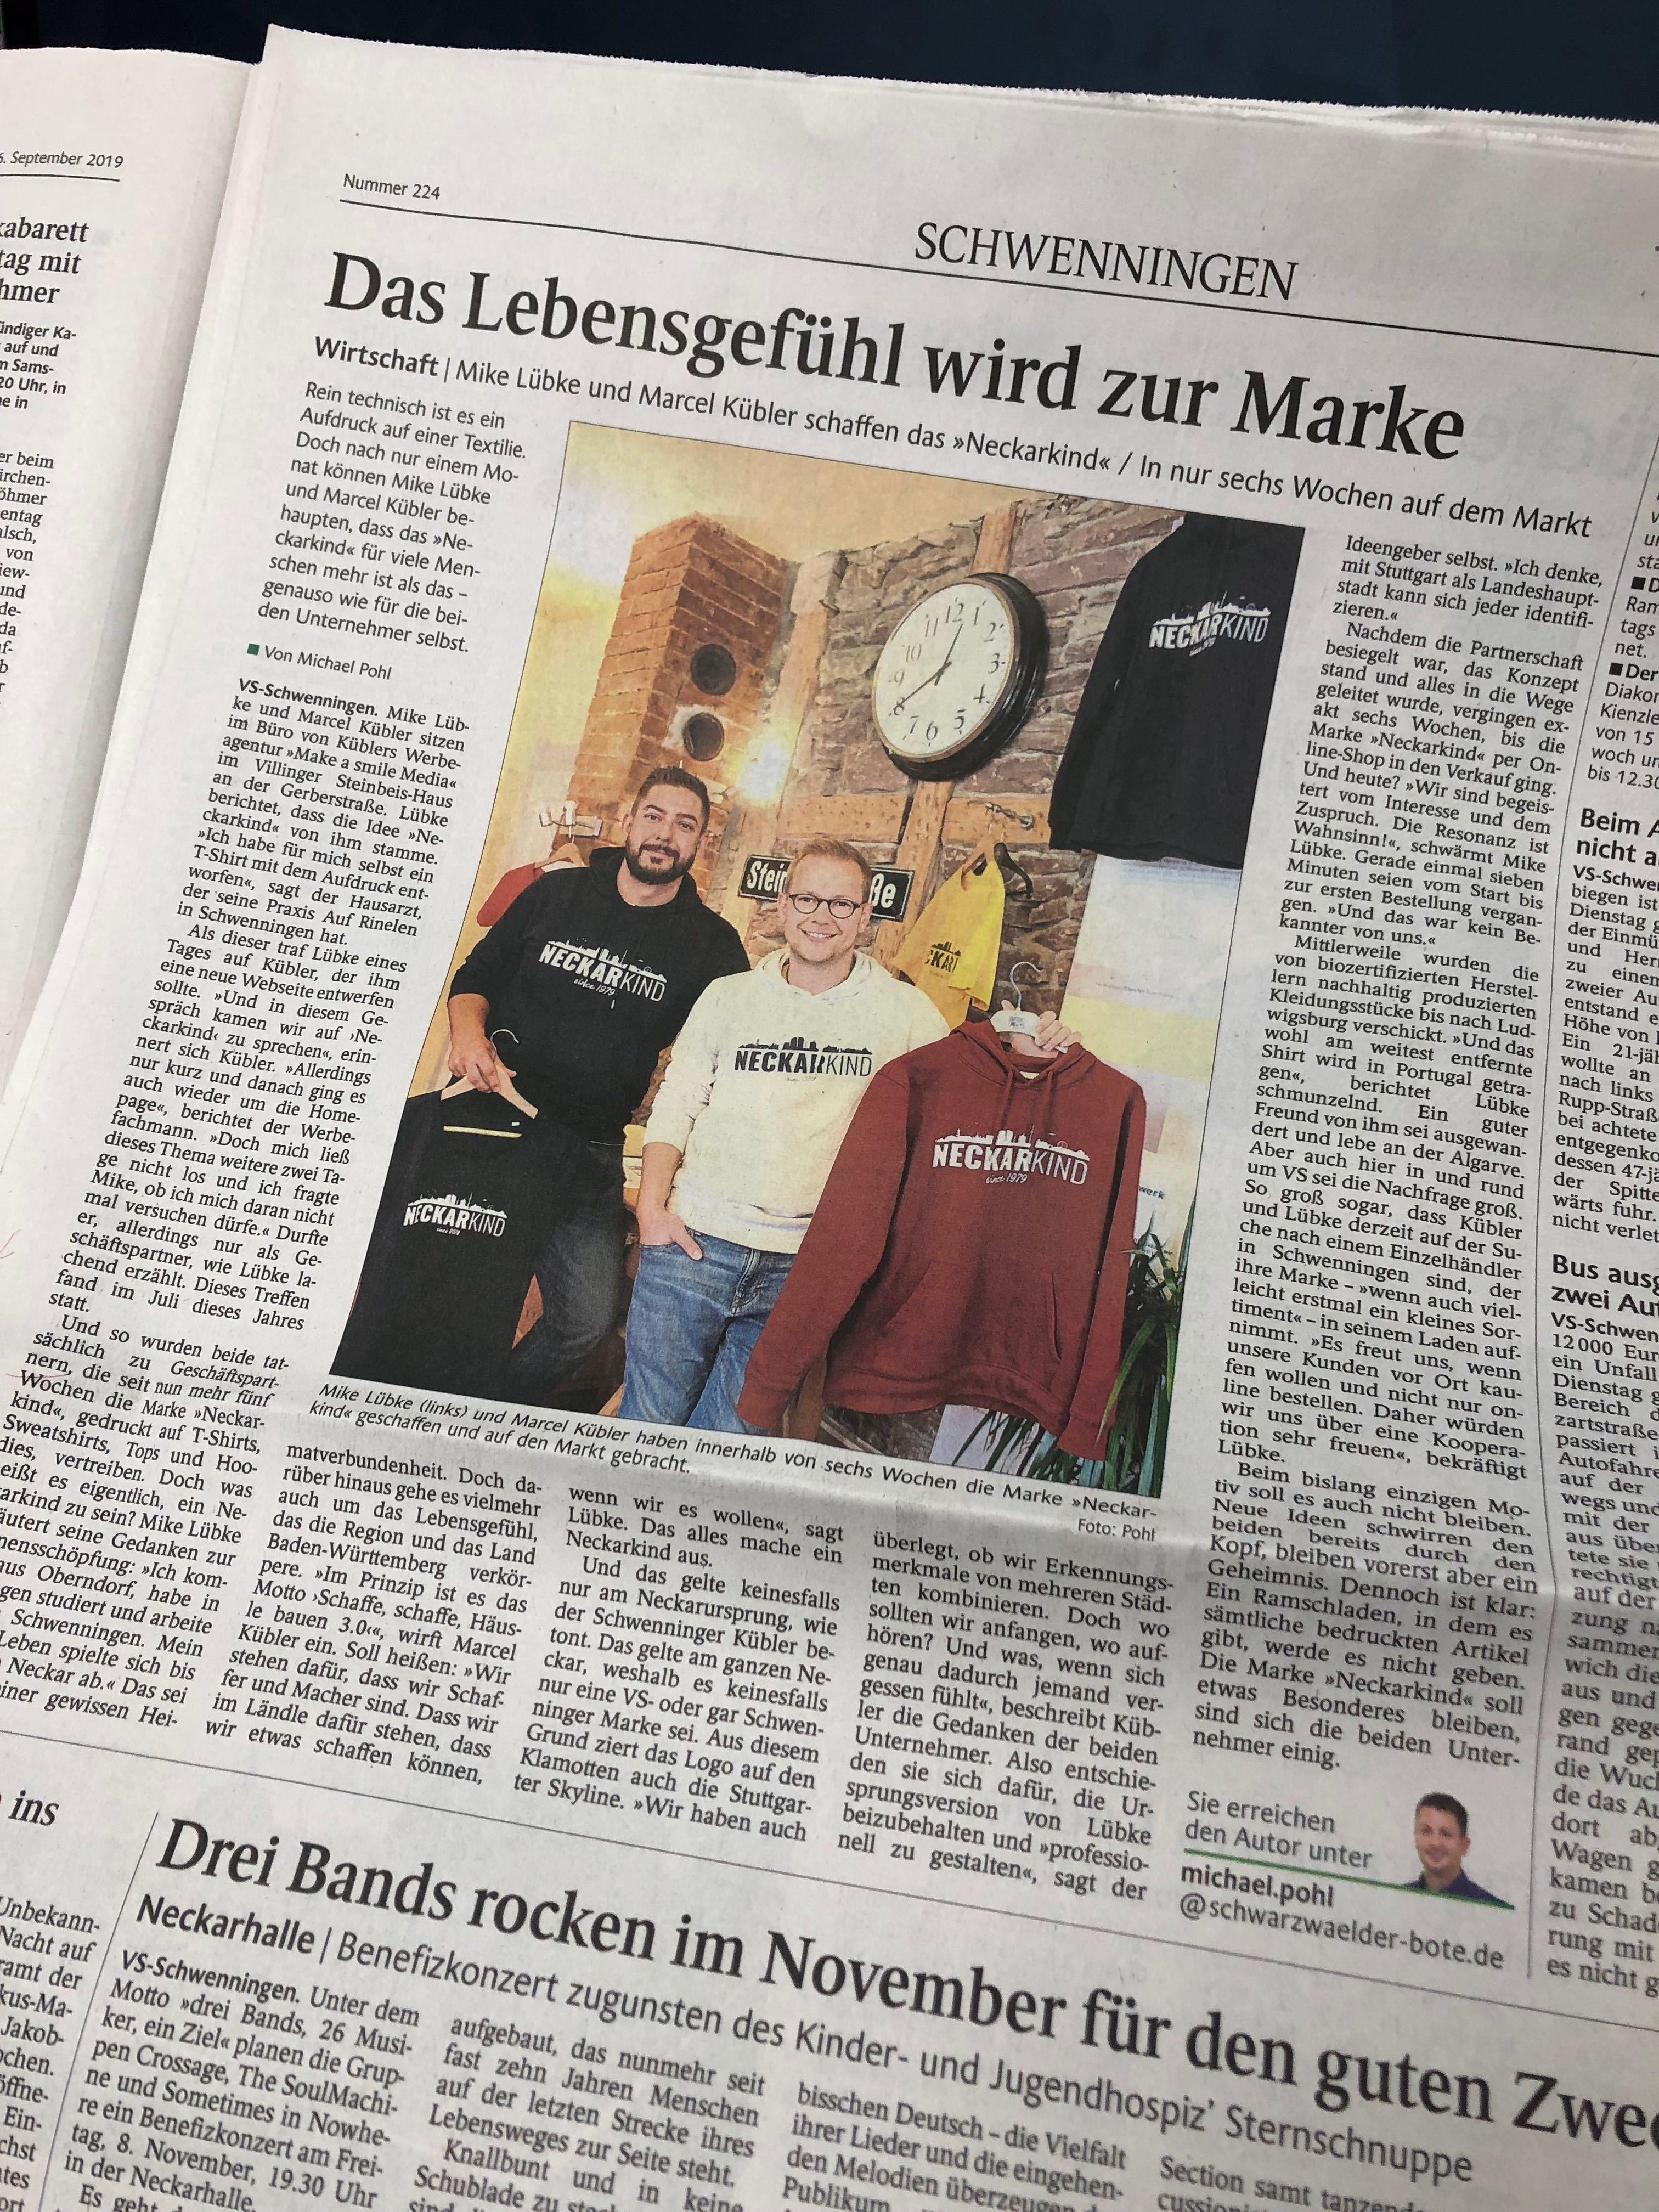 Neckarkind Gründer2